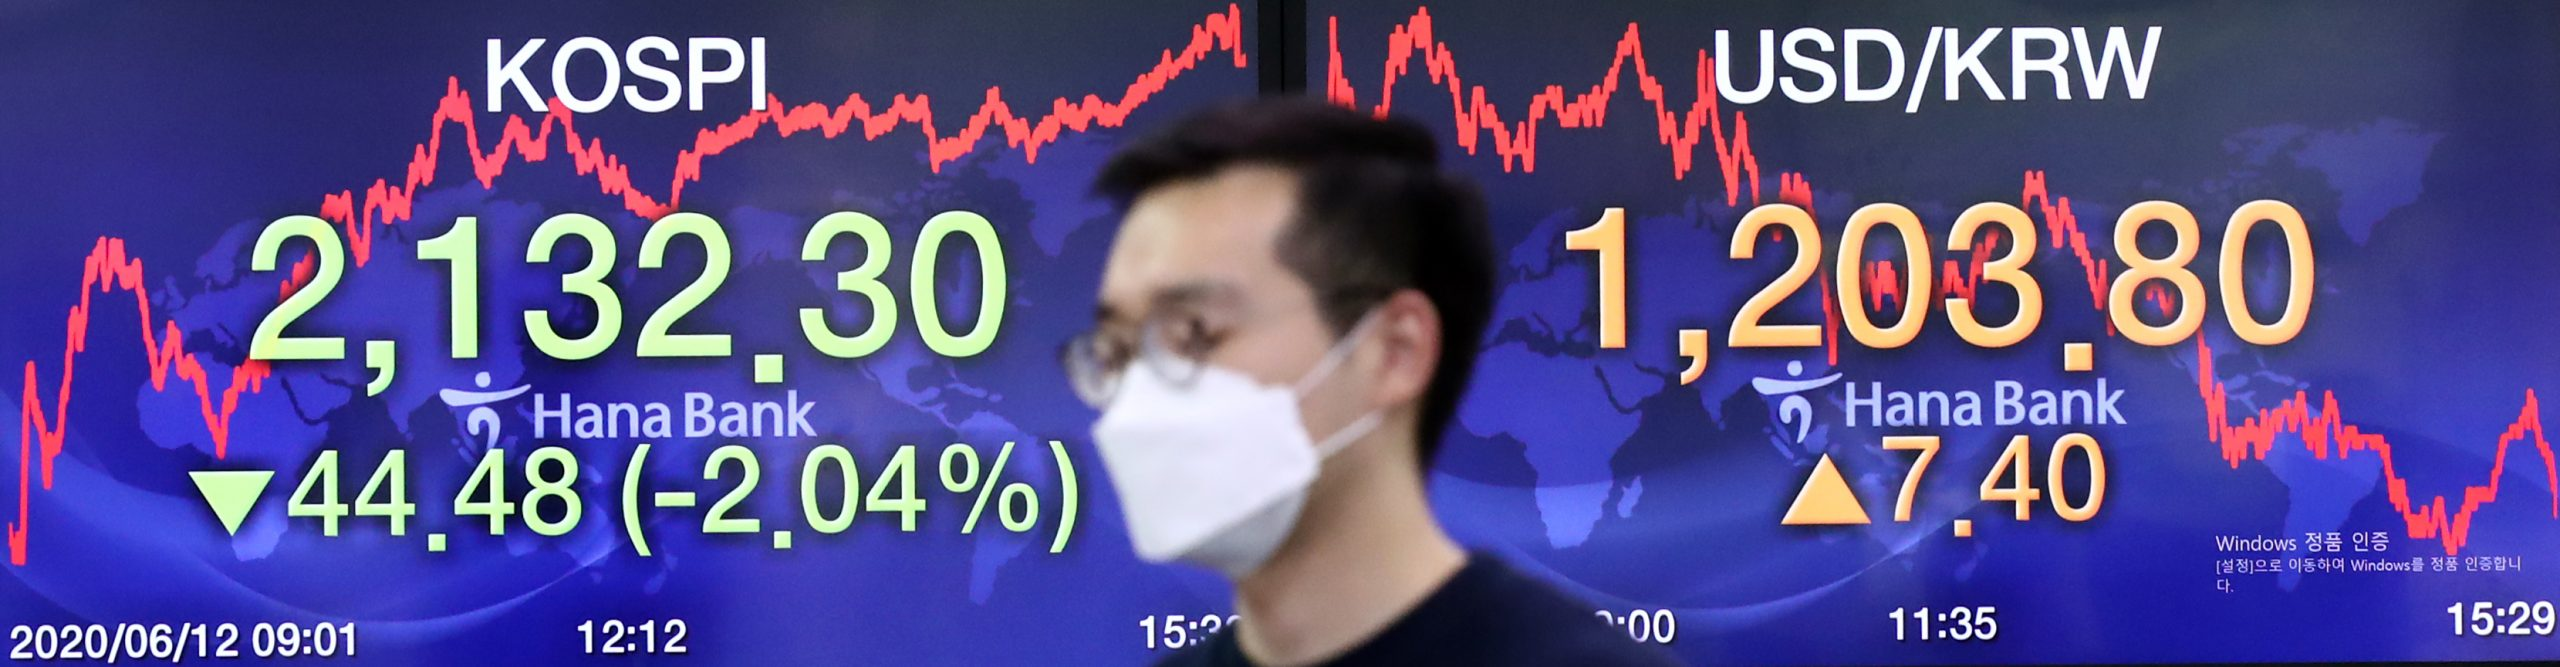 Dollar-denominated deposits at banks rise 30 pct over pandemic